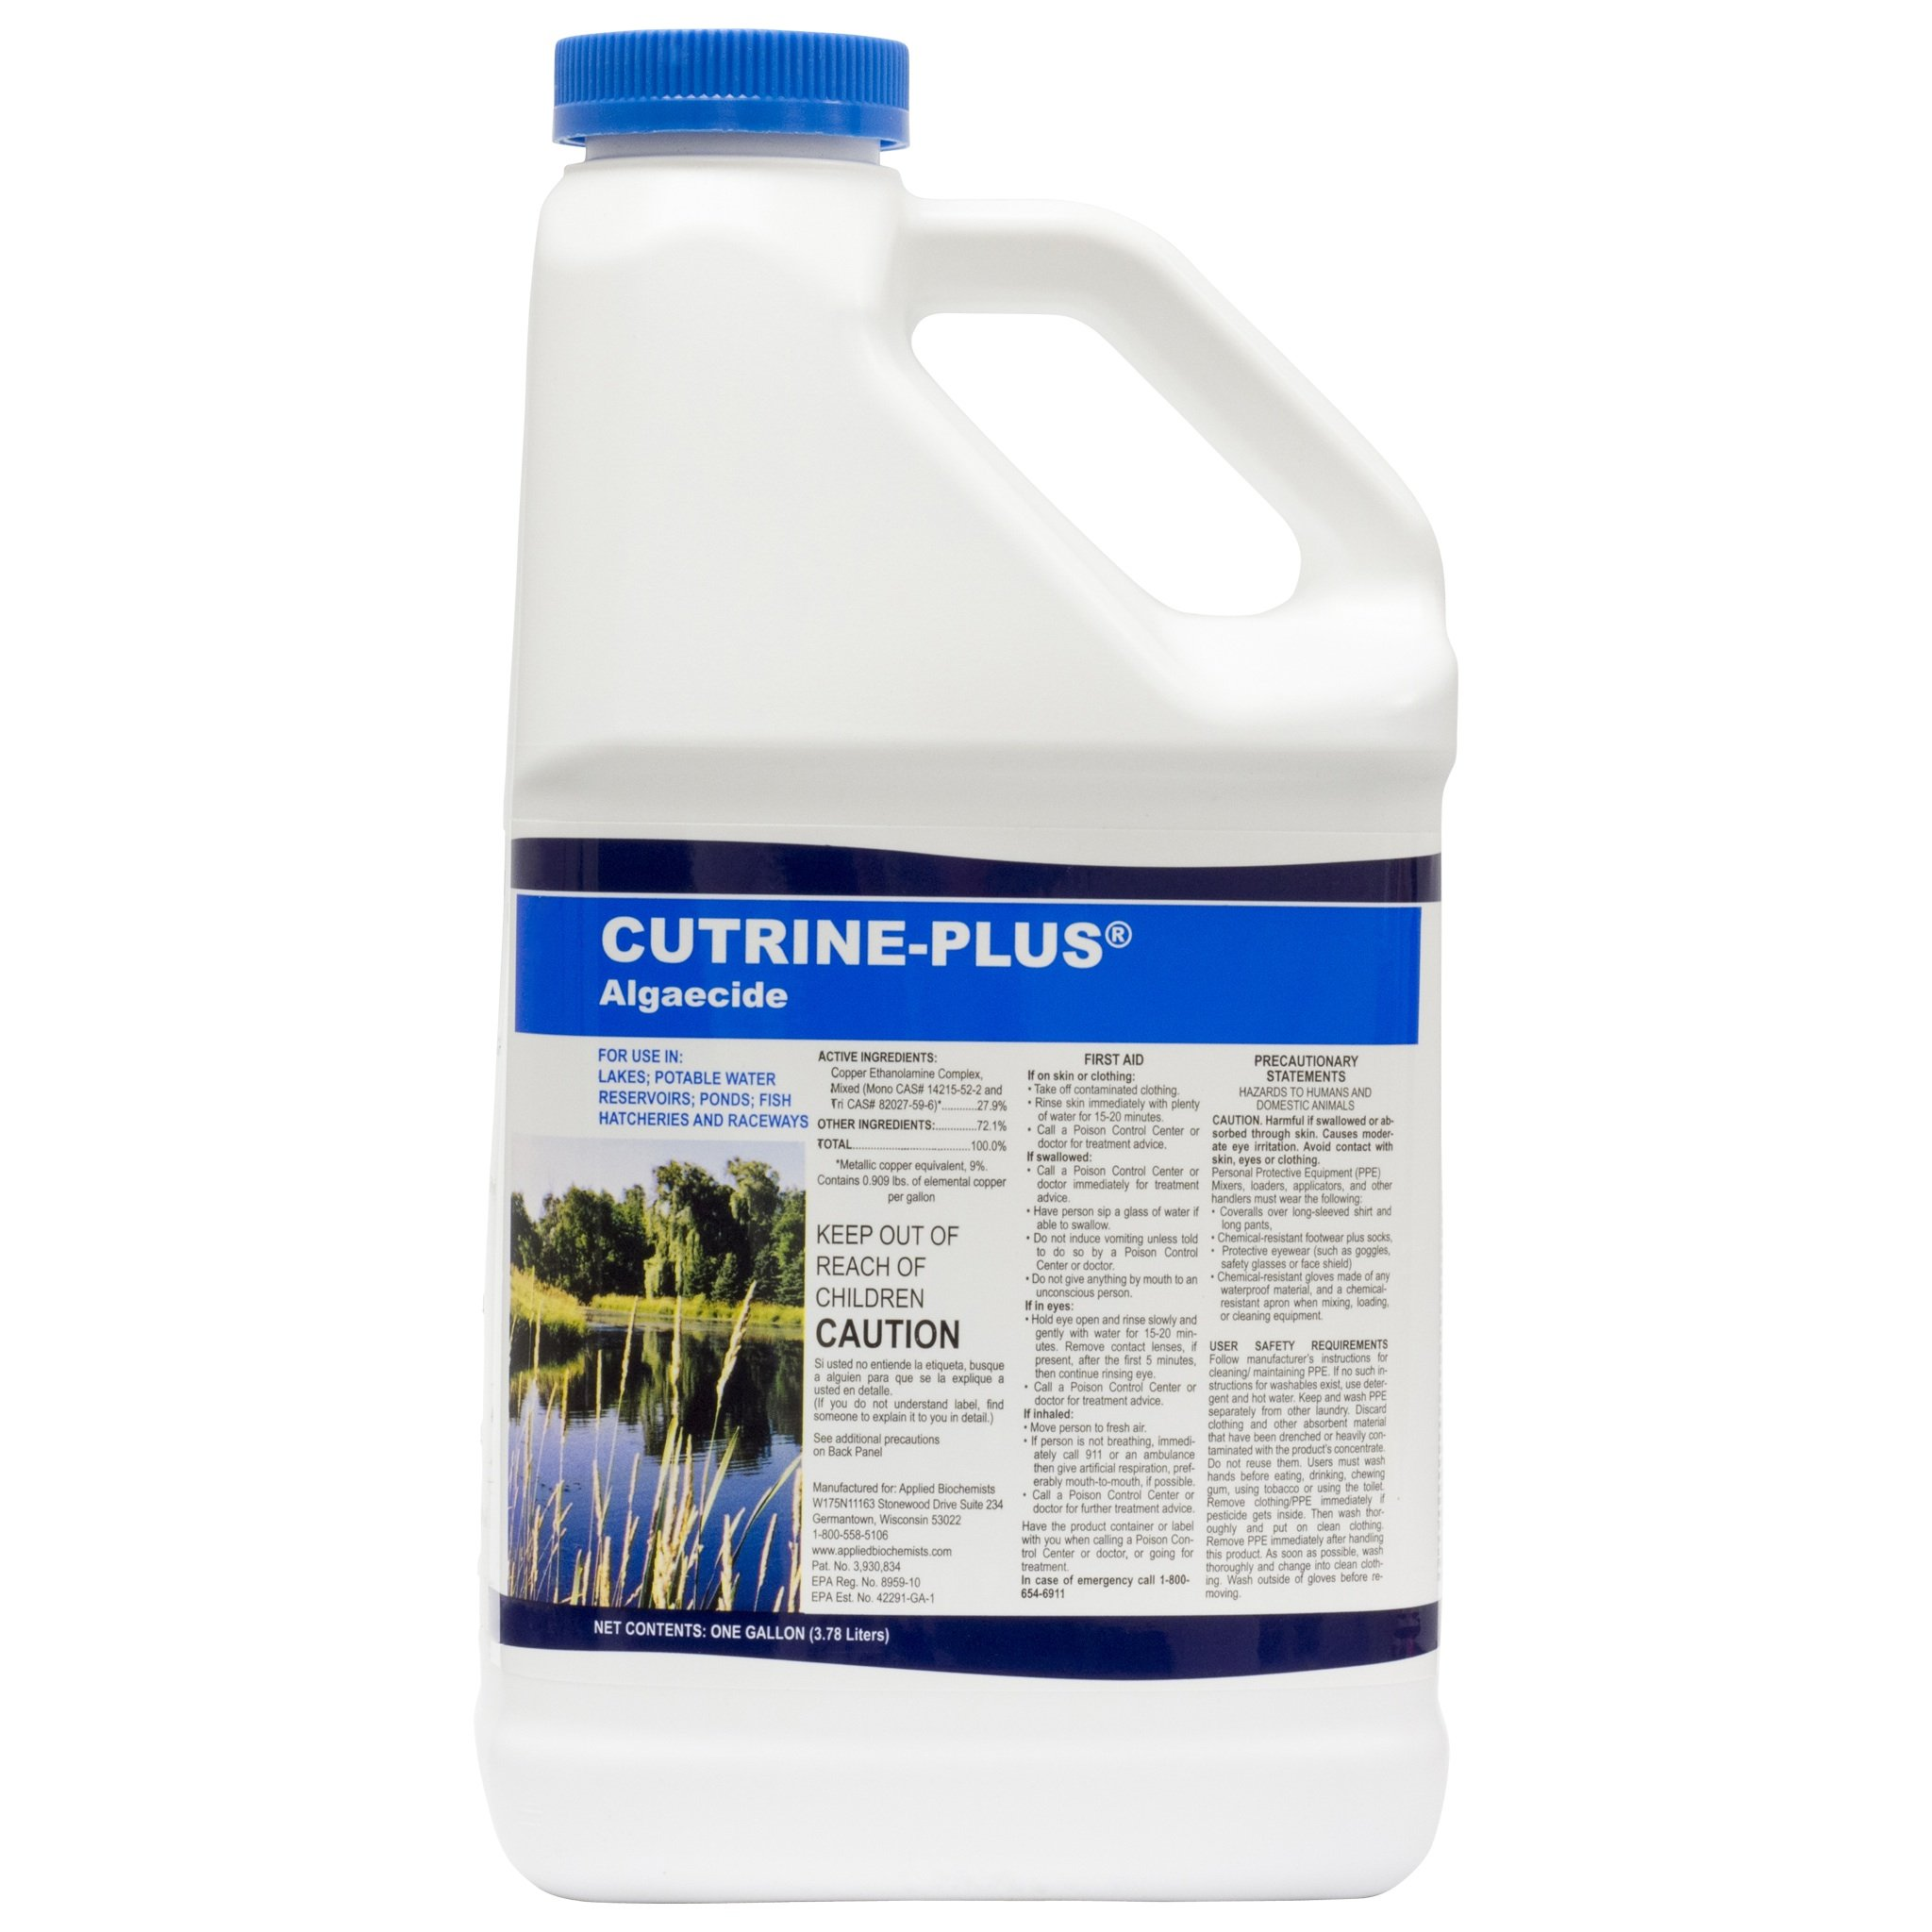 Cutrine Plus 4 Gallons abc-1003cs